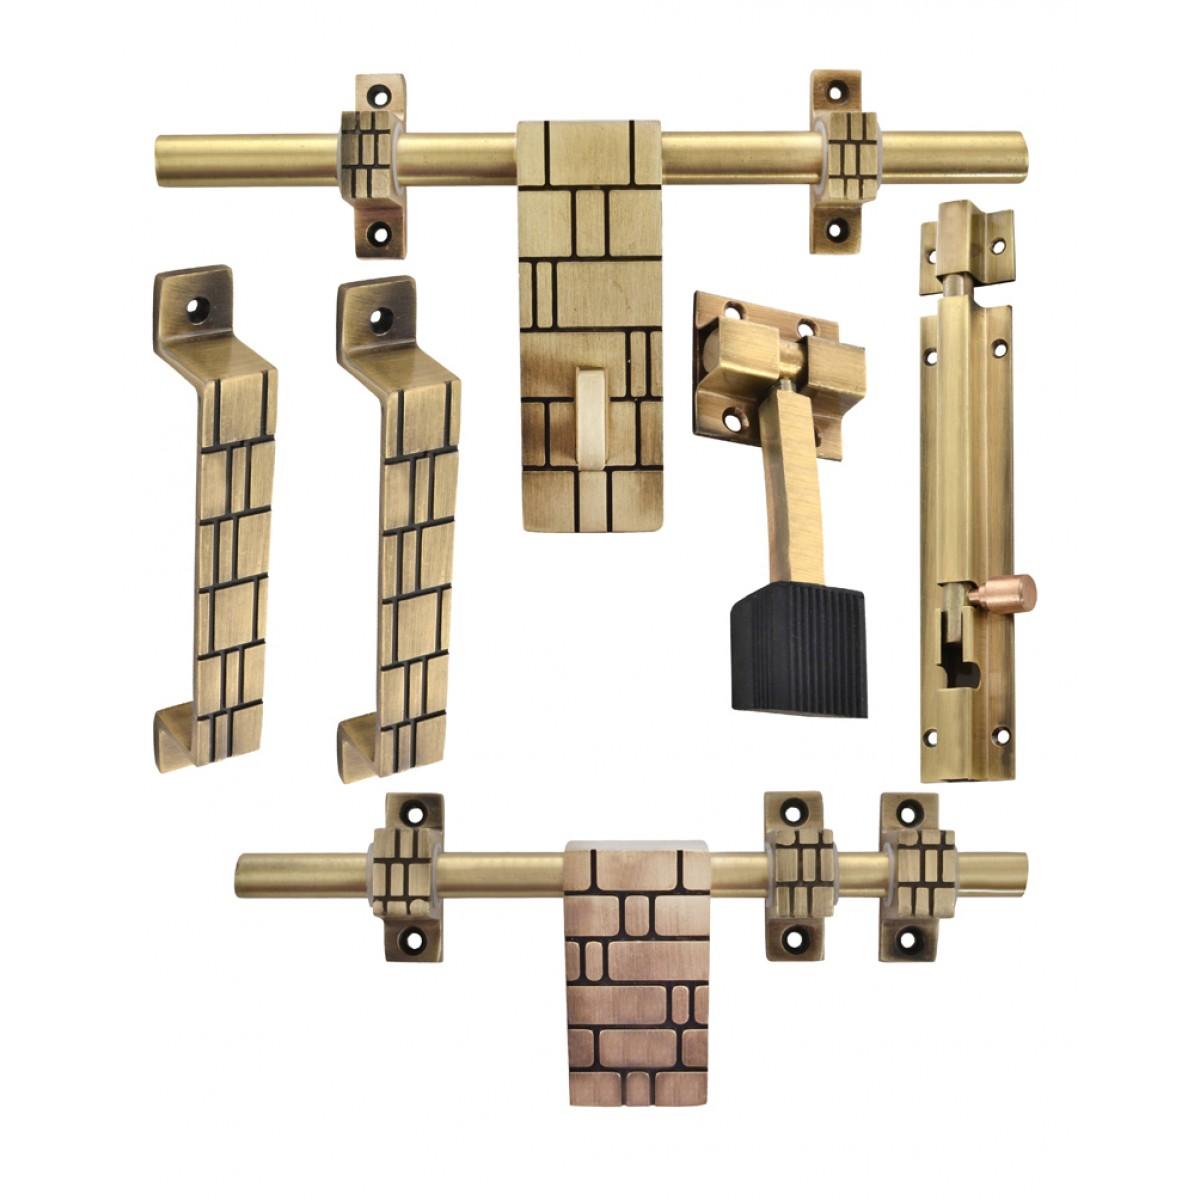 Klaxon Glorious 3 Brass Door Accessories Kit (Antique Finish)  sc 1 st  Klaxon Hardware & Klaxon Glorious 3 Brass Door Accessories Kit (Antique Finish) - Door ...